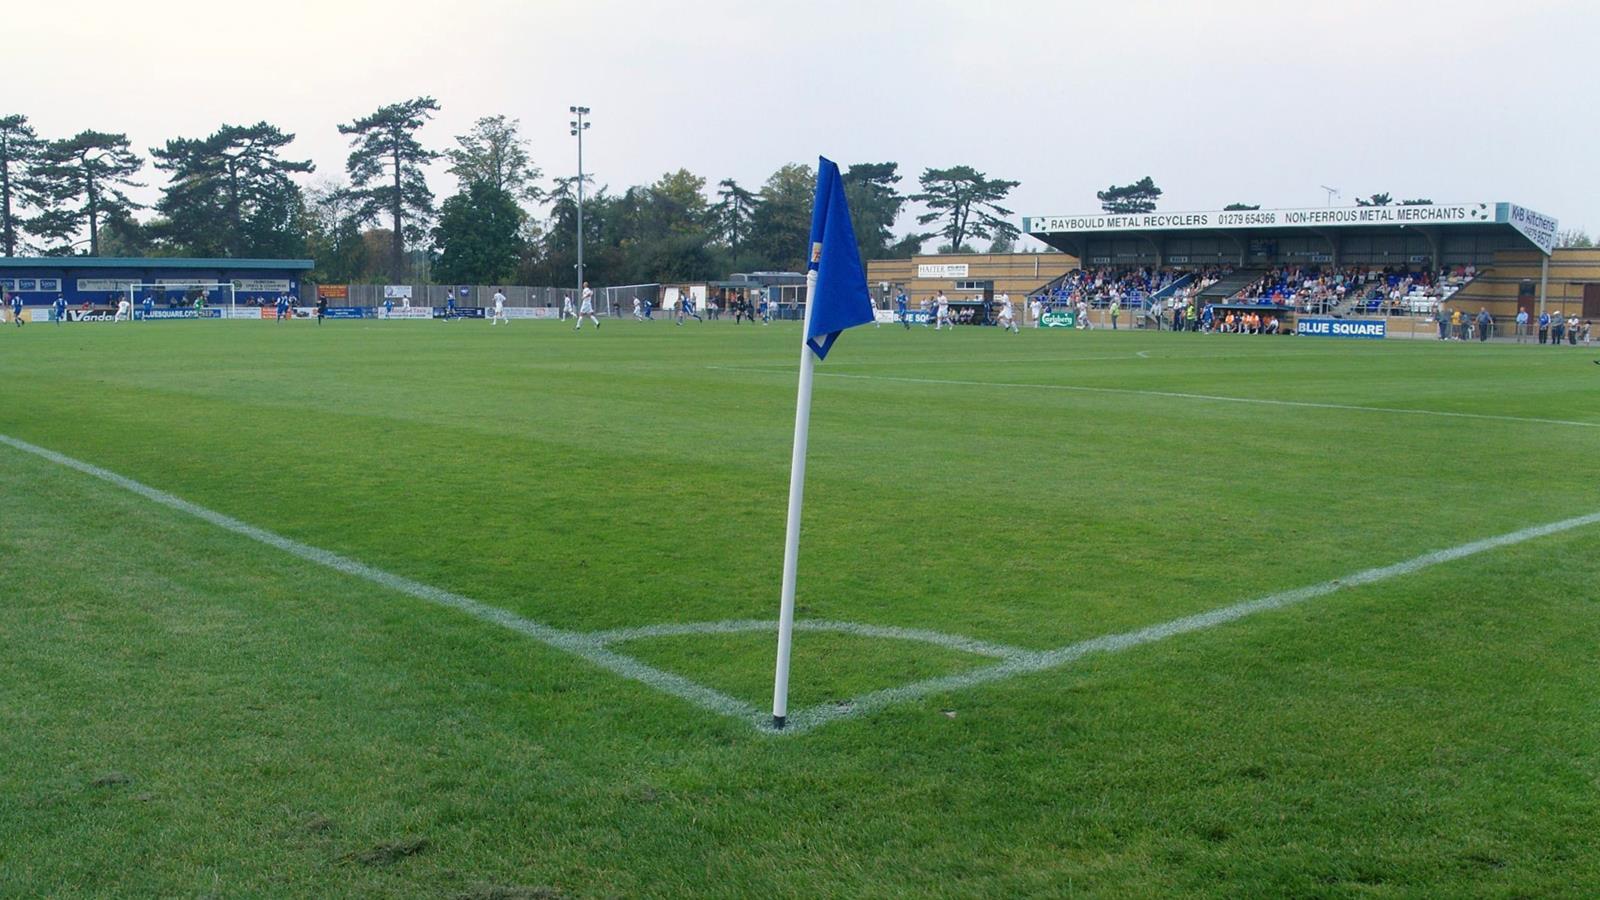 UP NEXT: BISHOP'S STORTFORD (A) - News - Stevenage Football Club